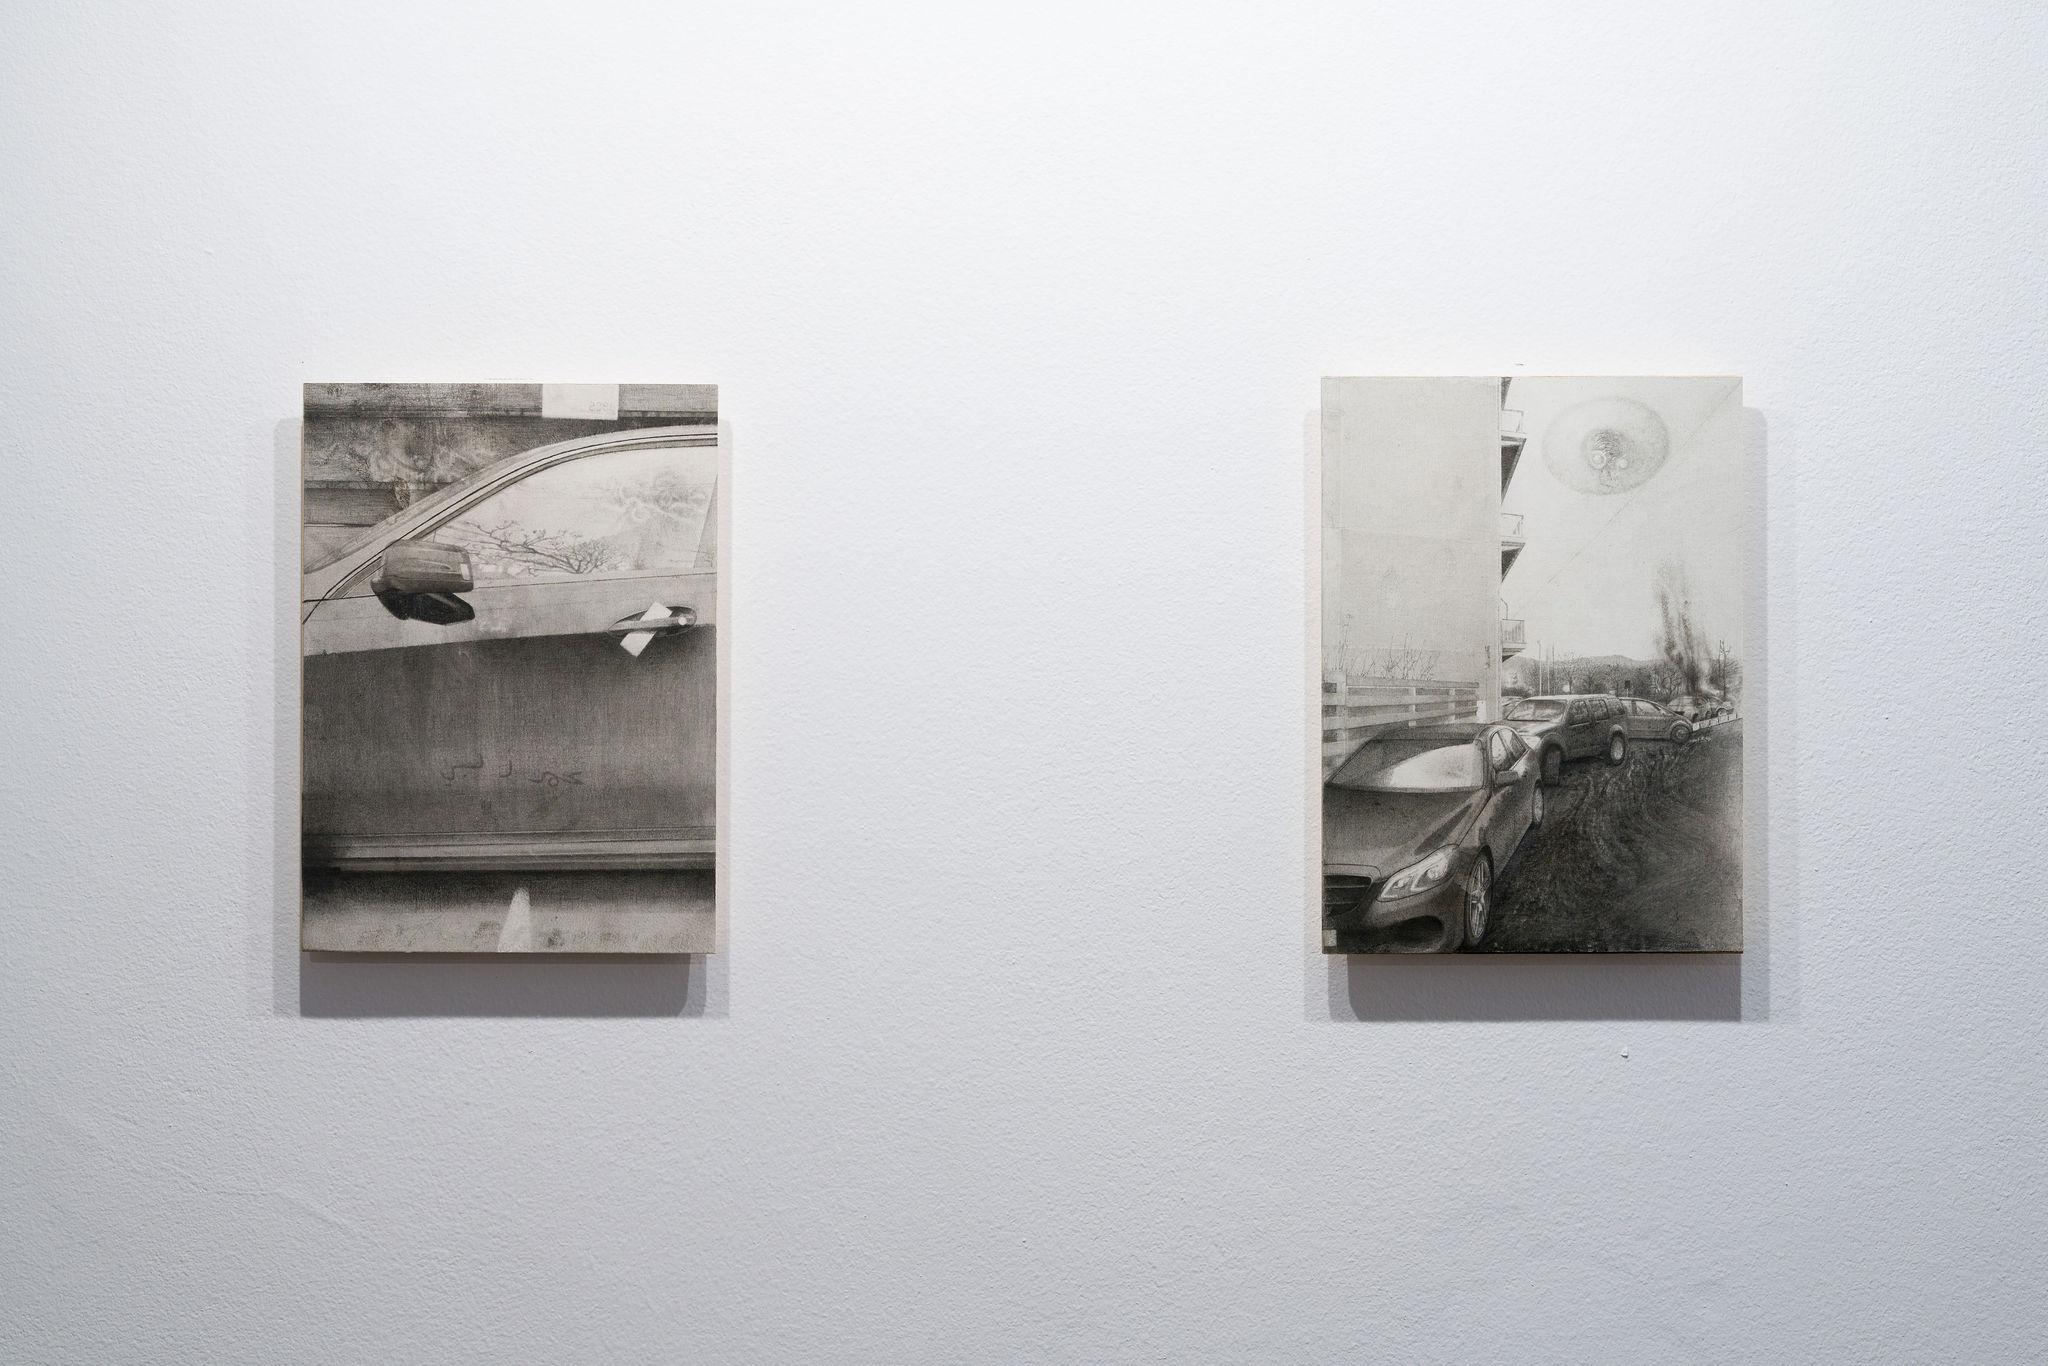 Soft UFO, 2021 & Hard UFO, 2021, both Graphite on paper mounted on wood